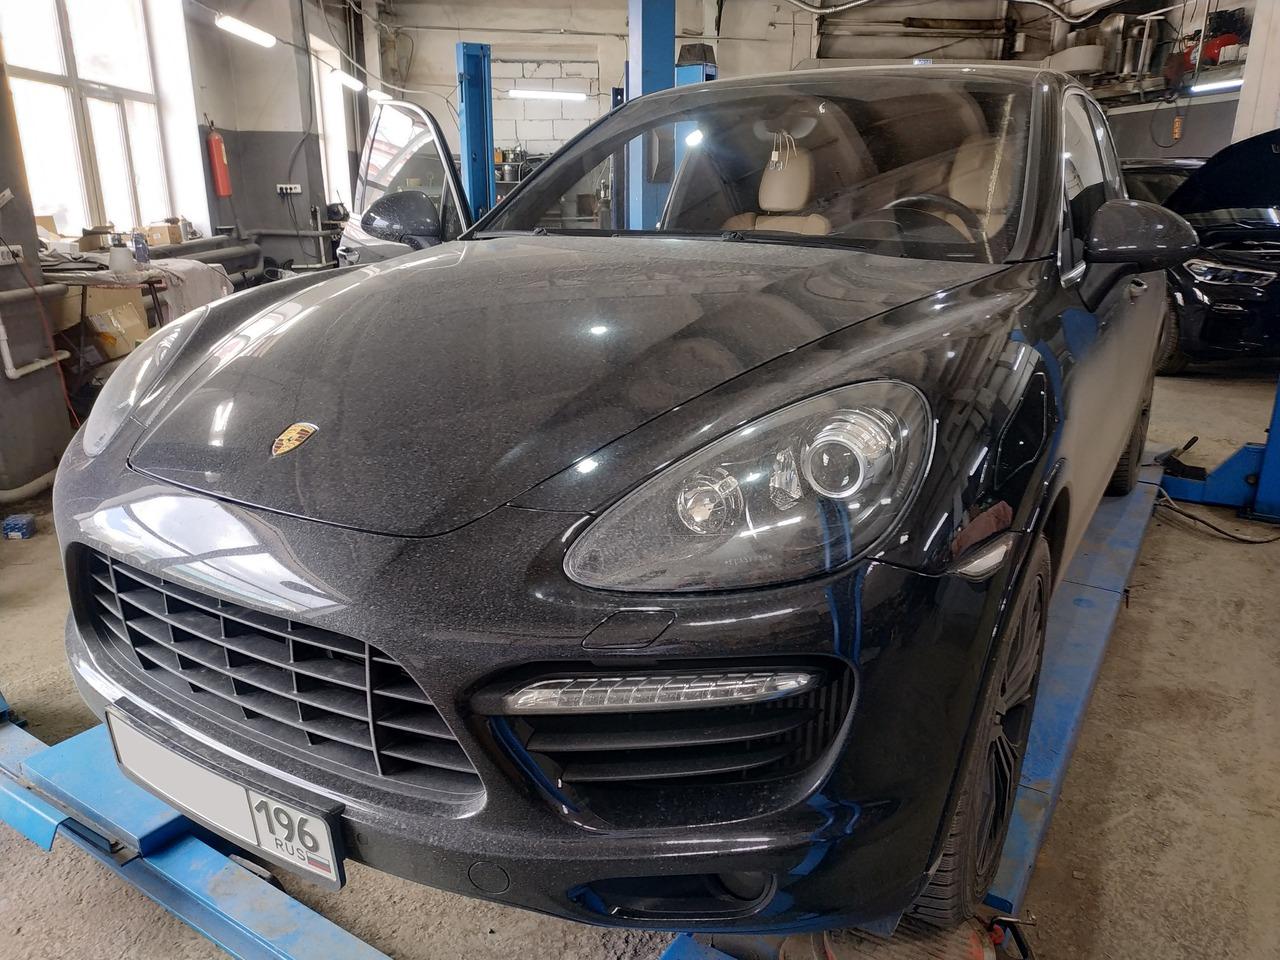 Porsche Cayenne 2013 г.в.